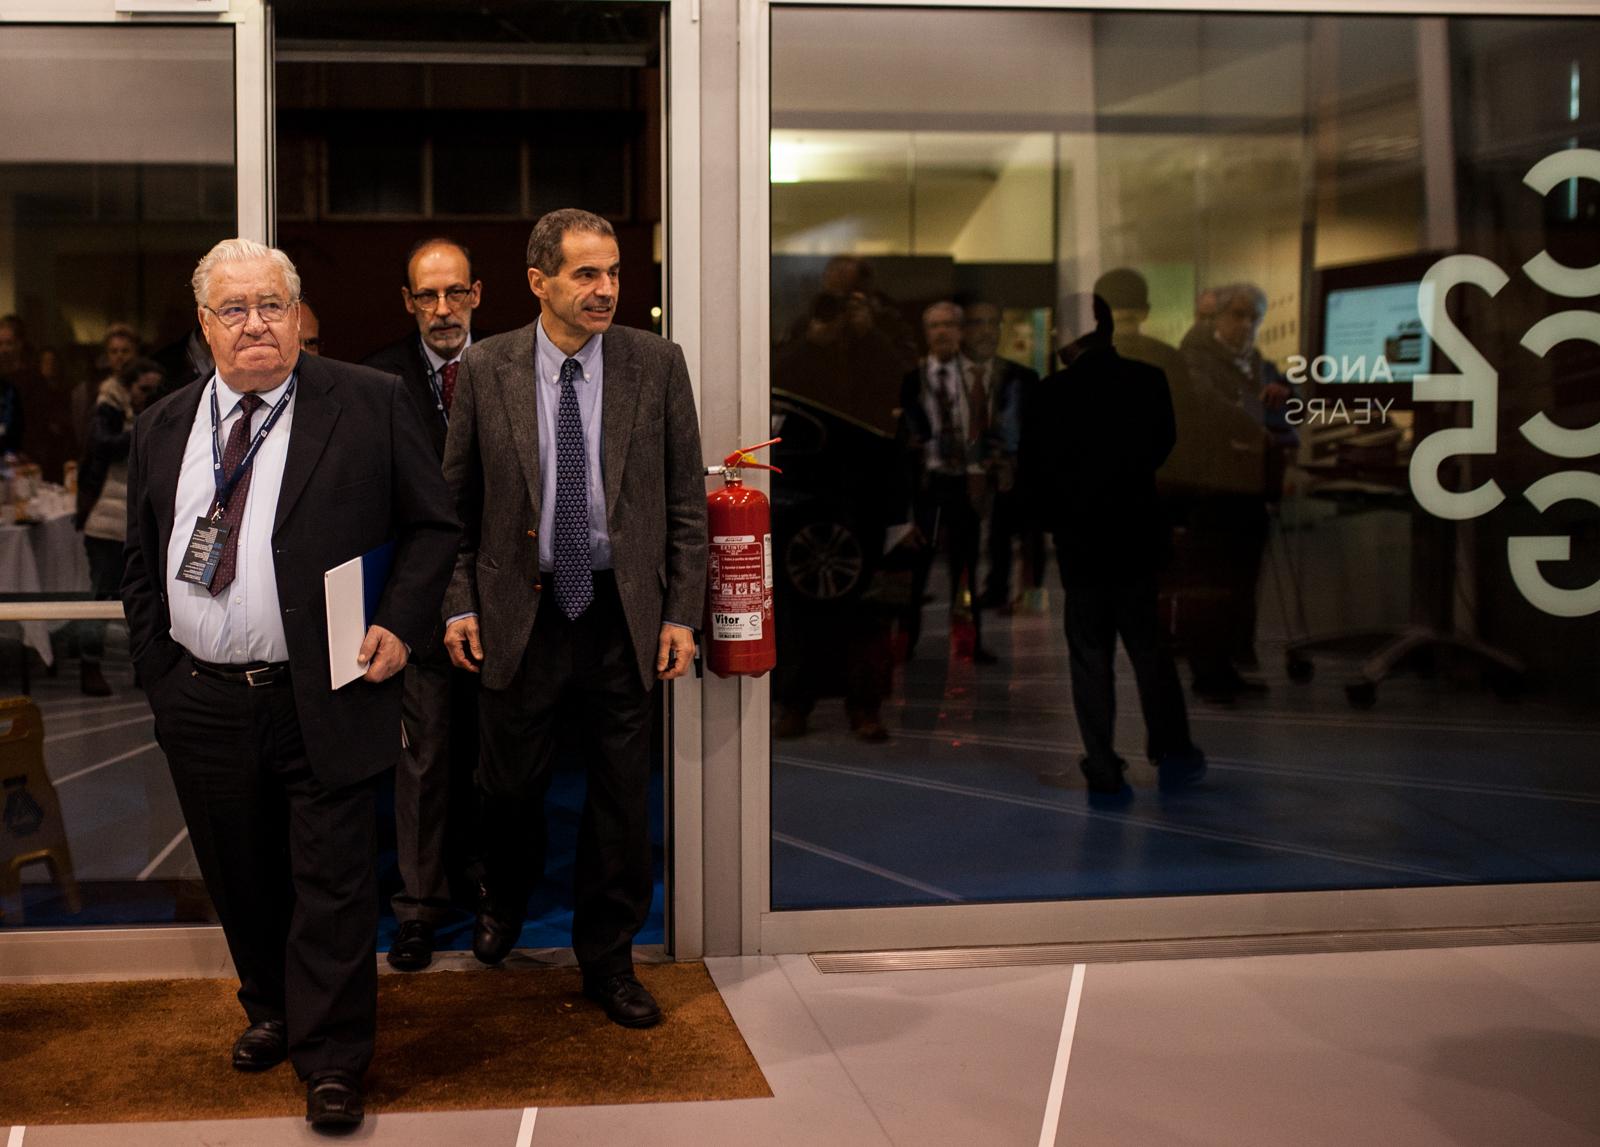 Chegada ao CCG (foto: Nuno Gonçalves)